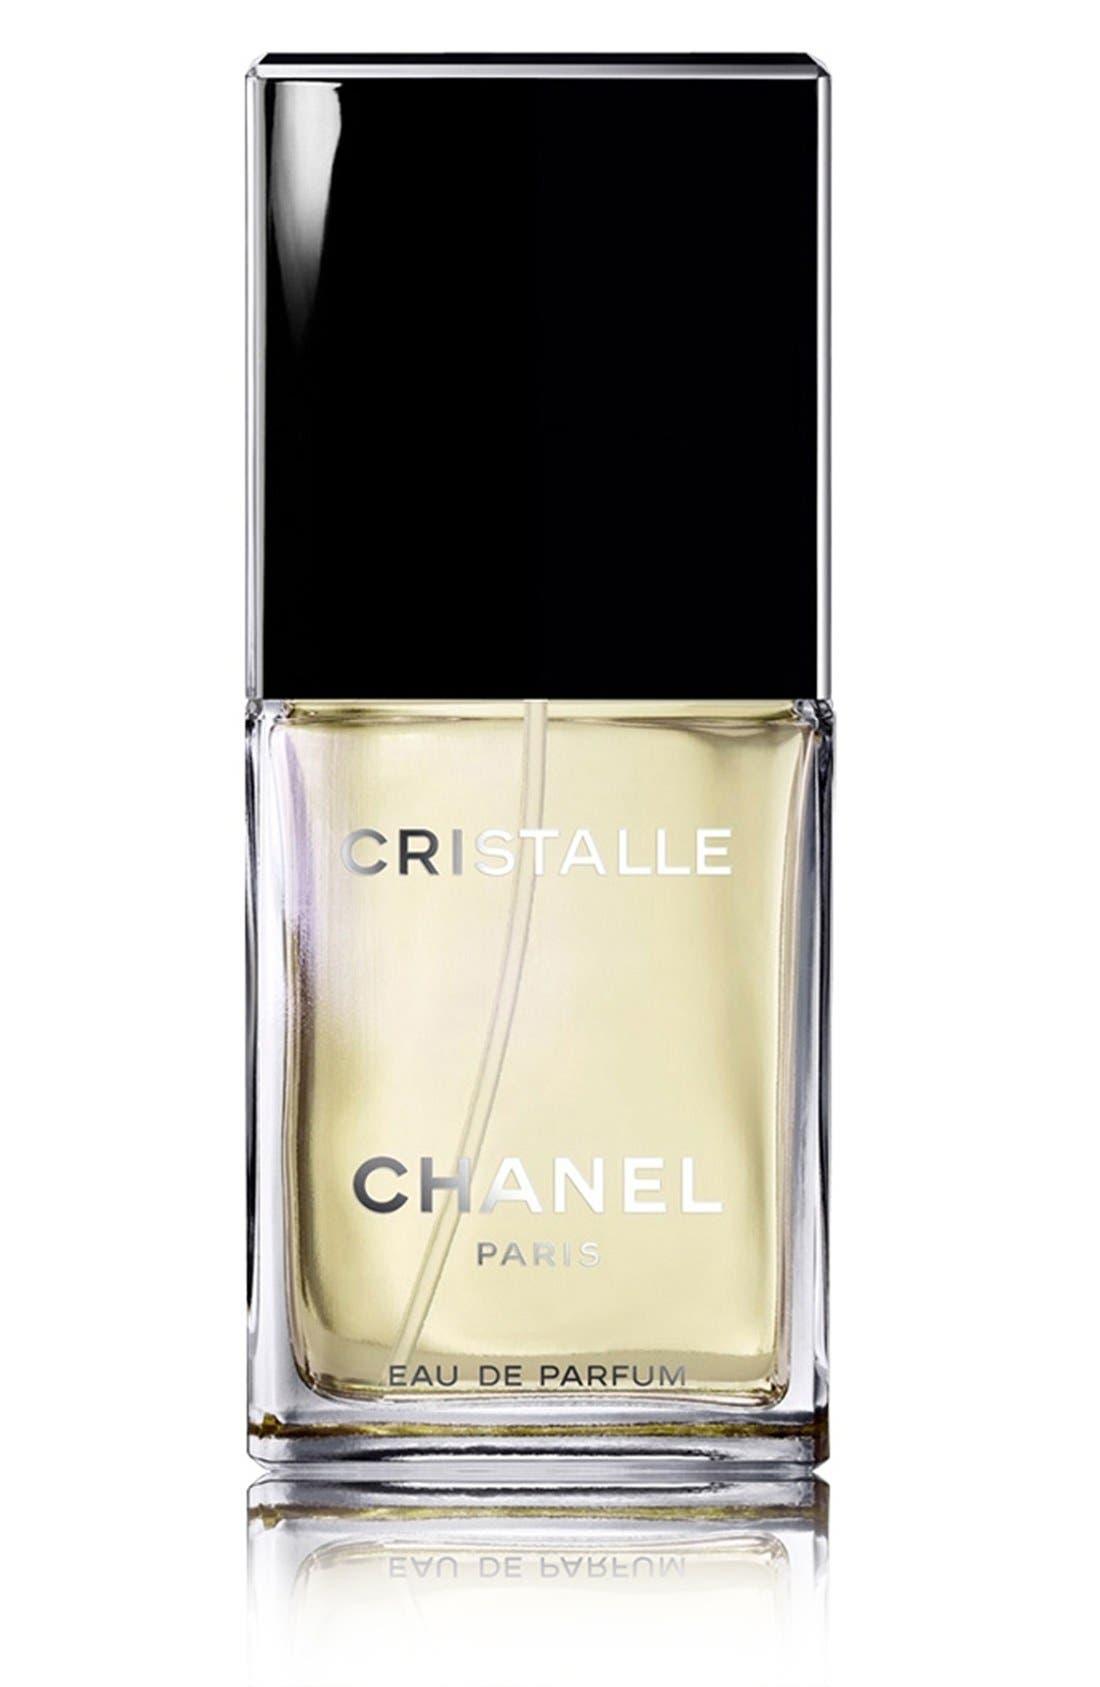 Chanel Perfume Fragrance Nordstrom La Mer Collections Mississippi Silver Vintage Bracelet Wrap Watch